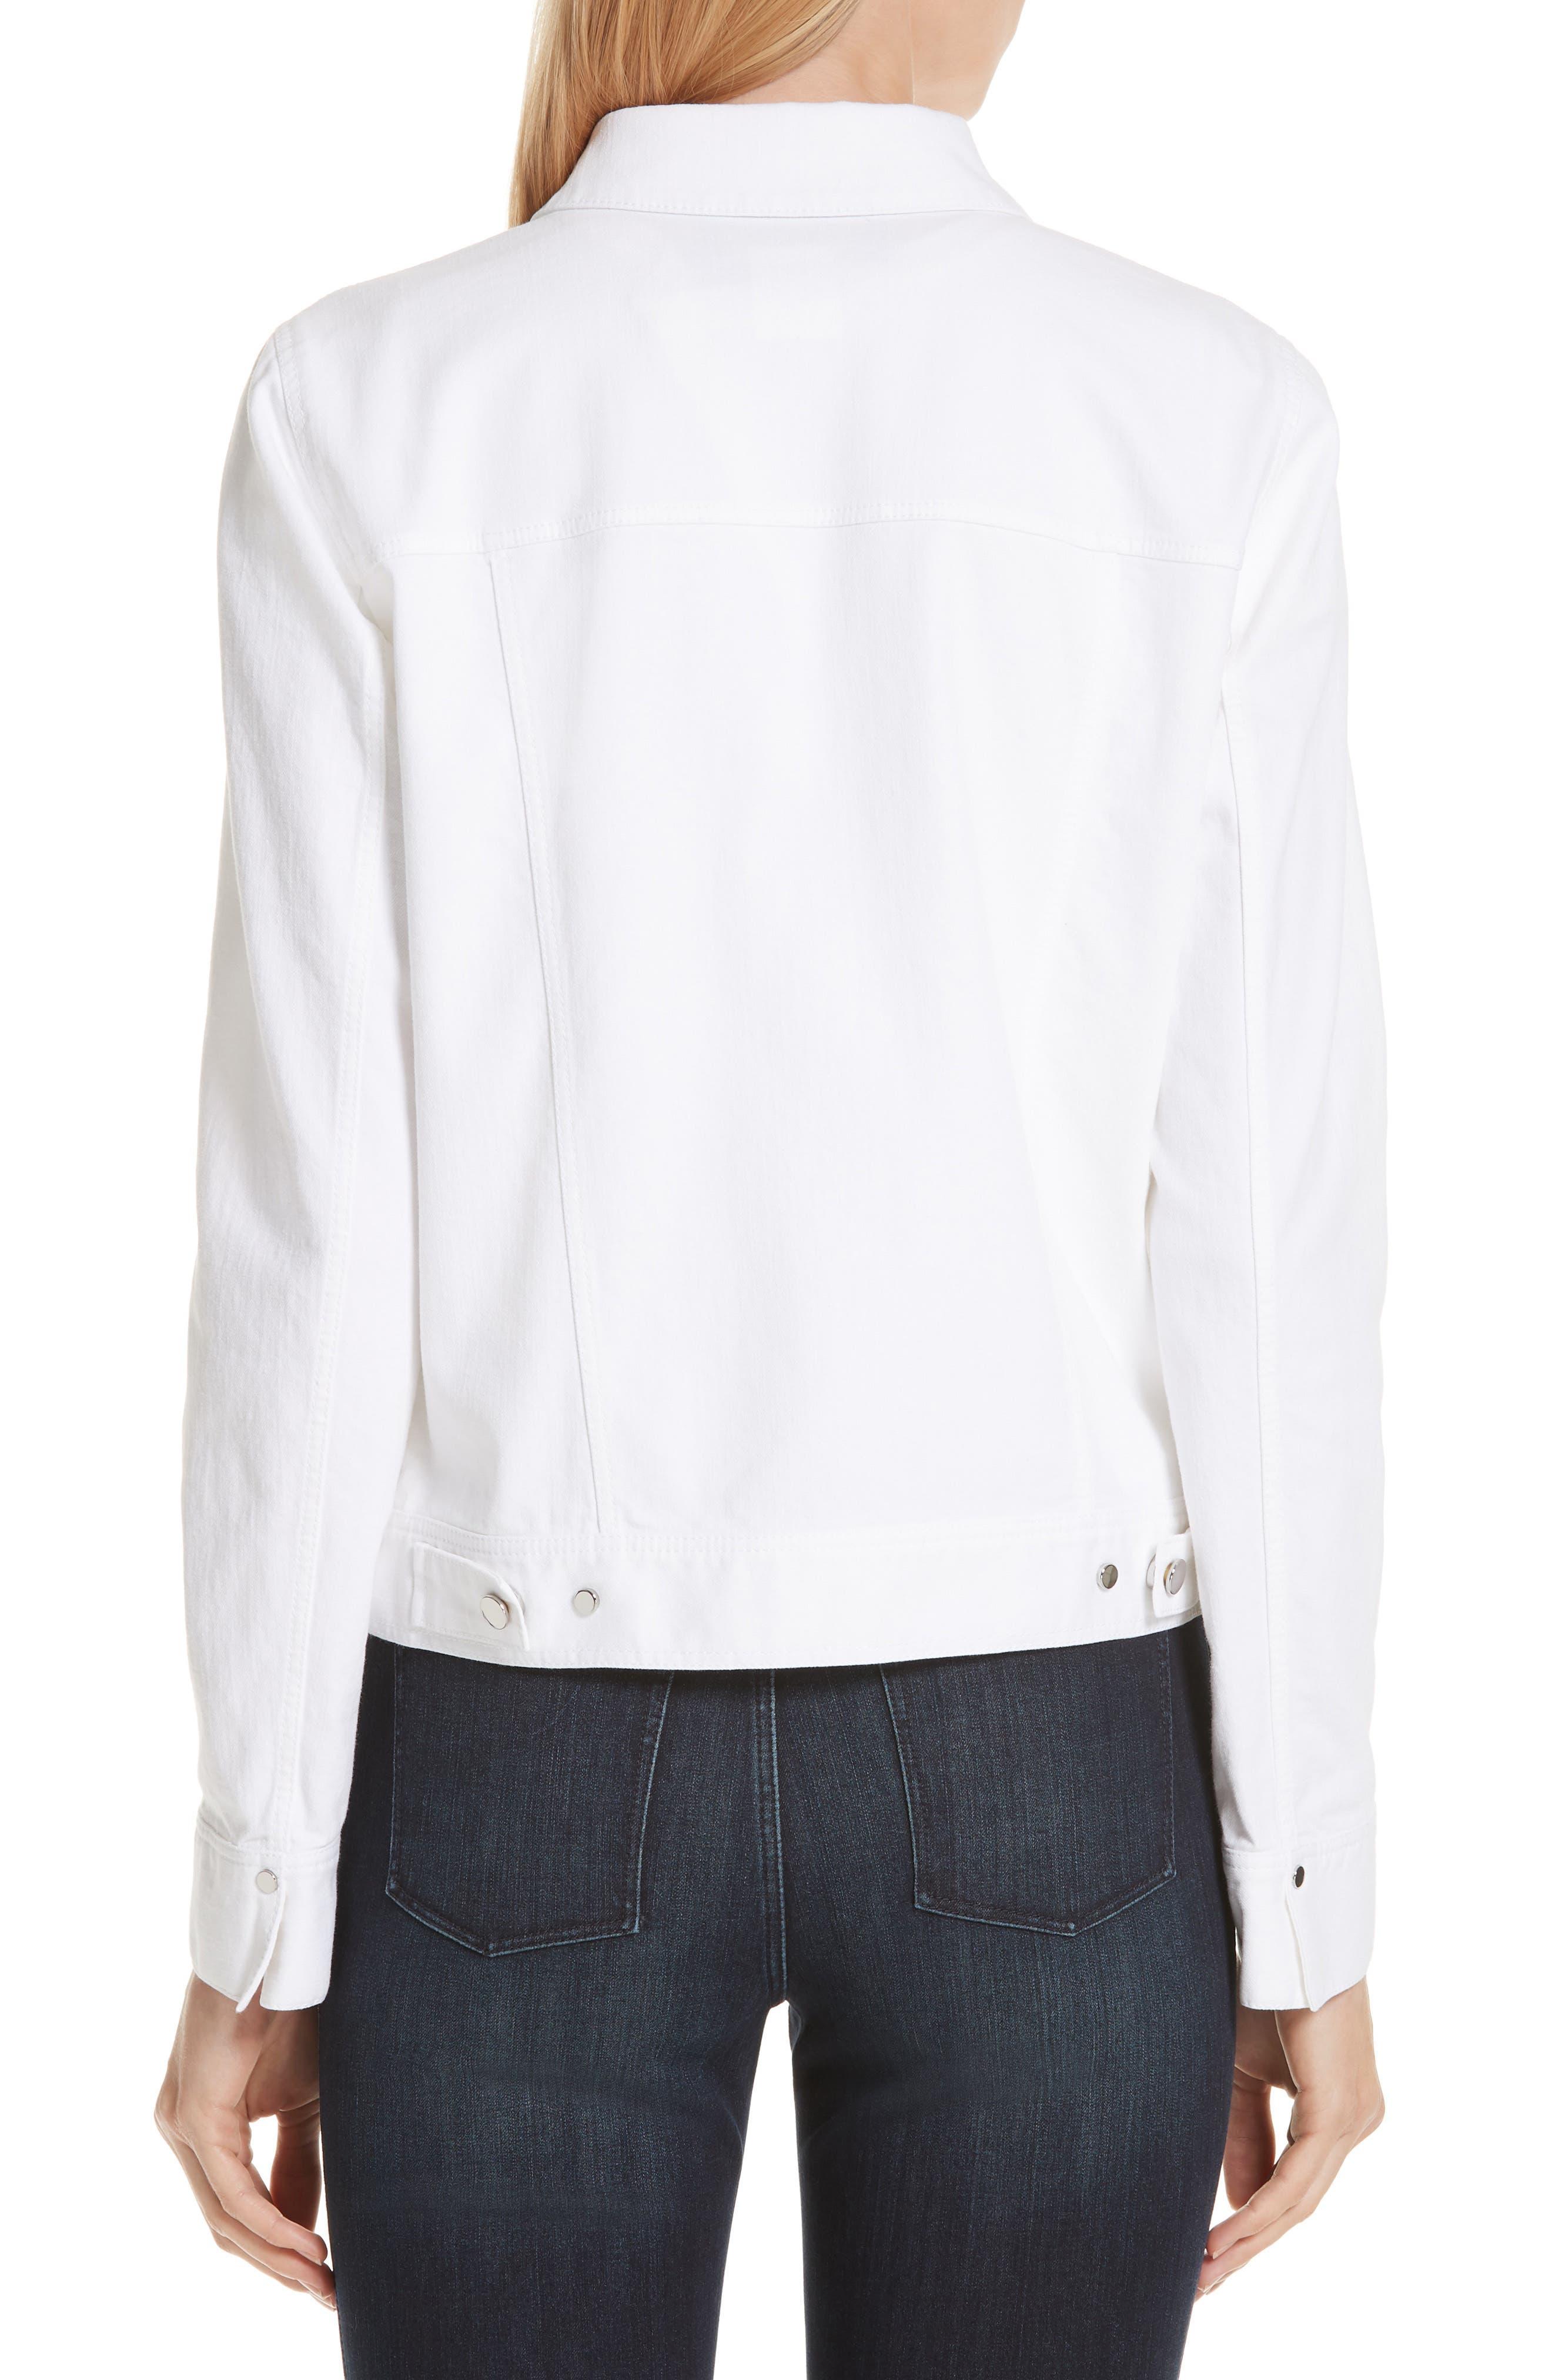 Kesha Denim Jacket,                             Alternate thumbnail 2, color,                             WHITE